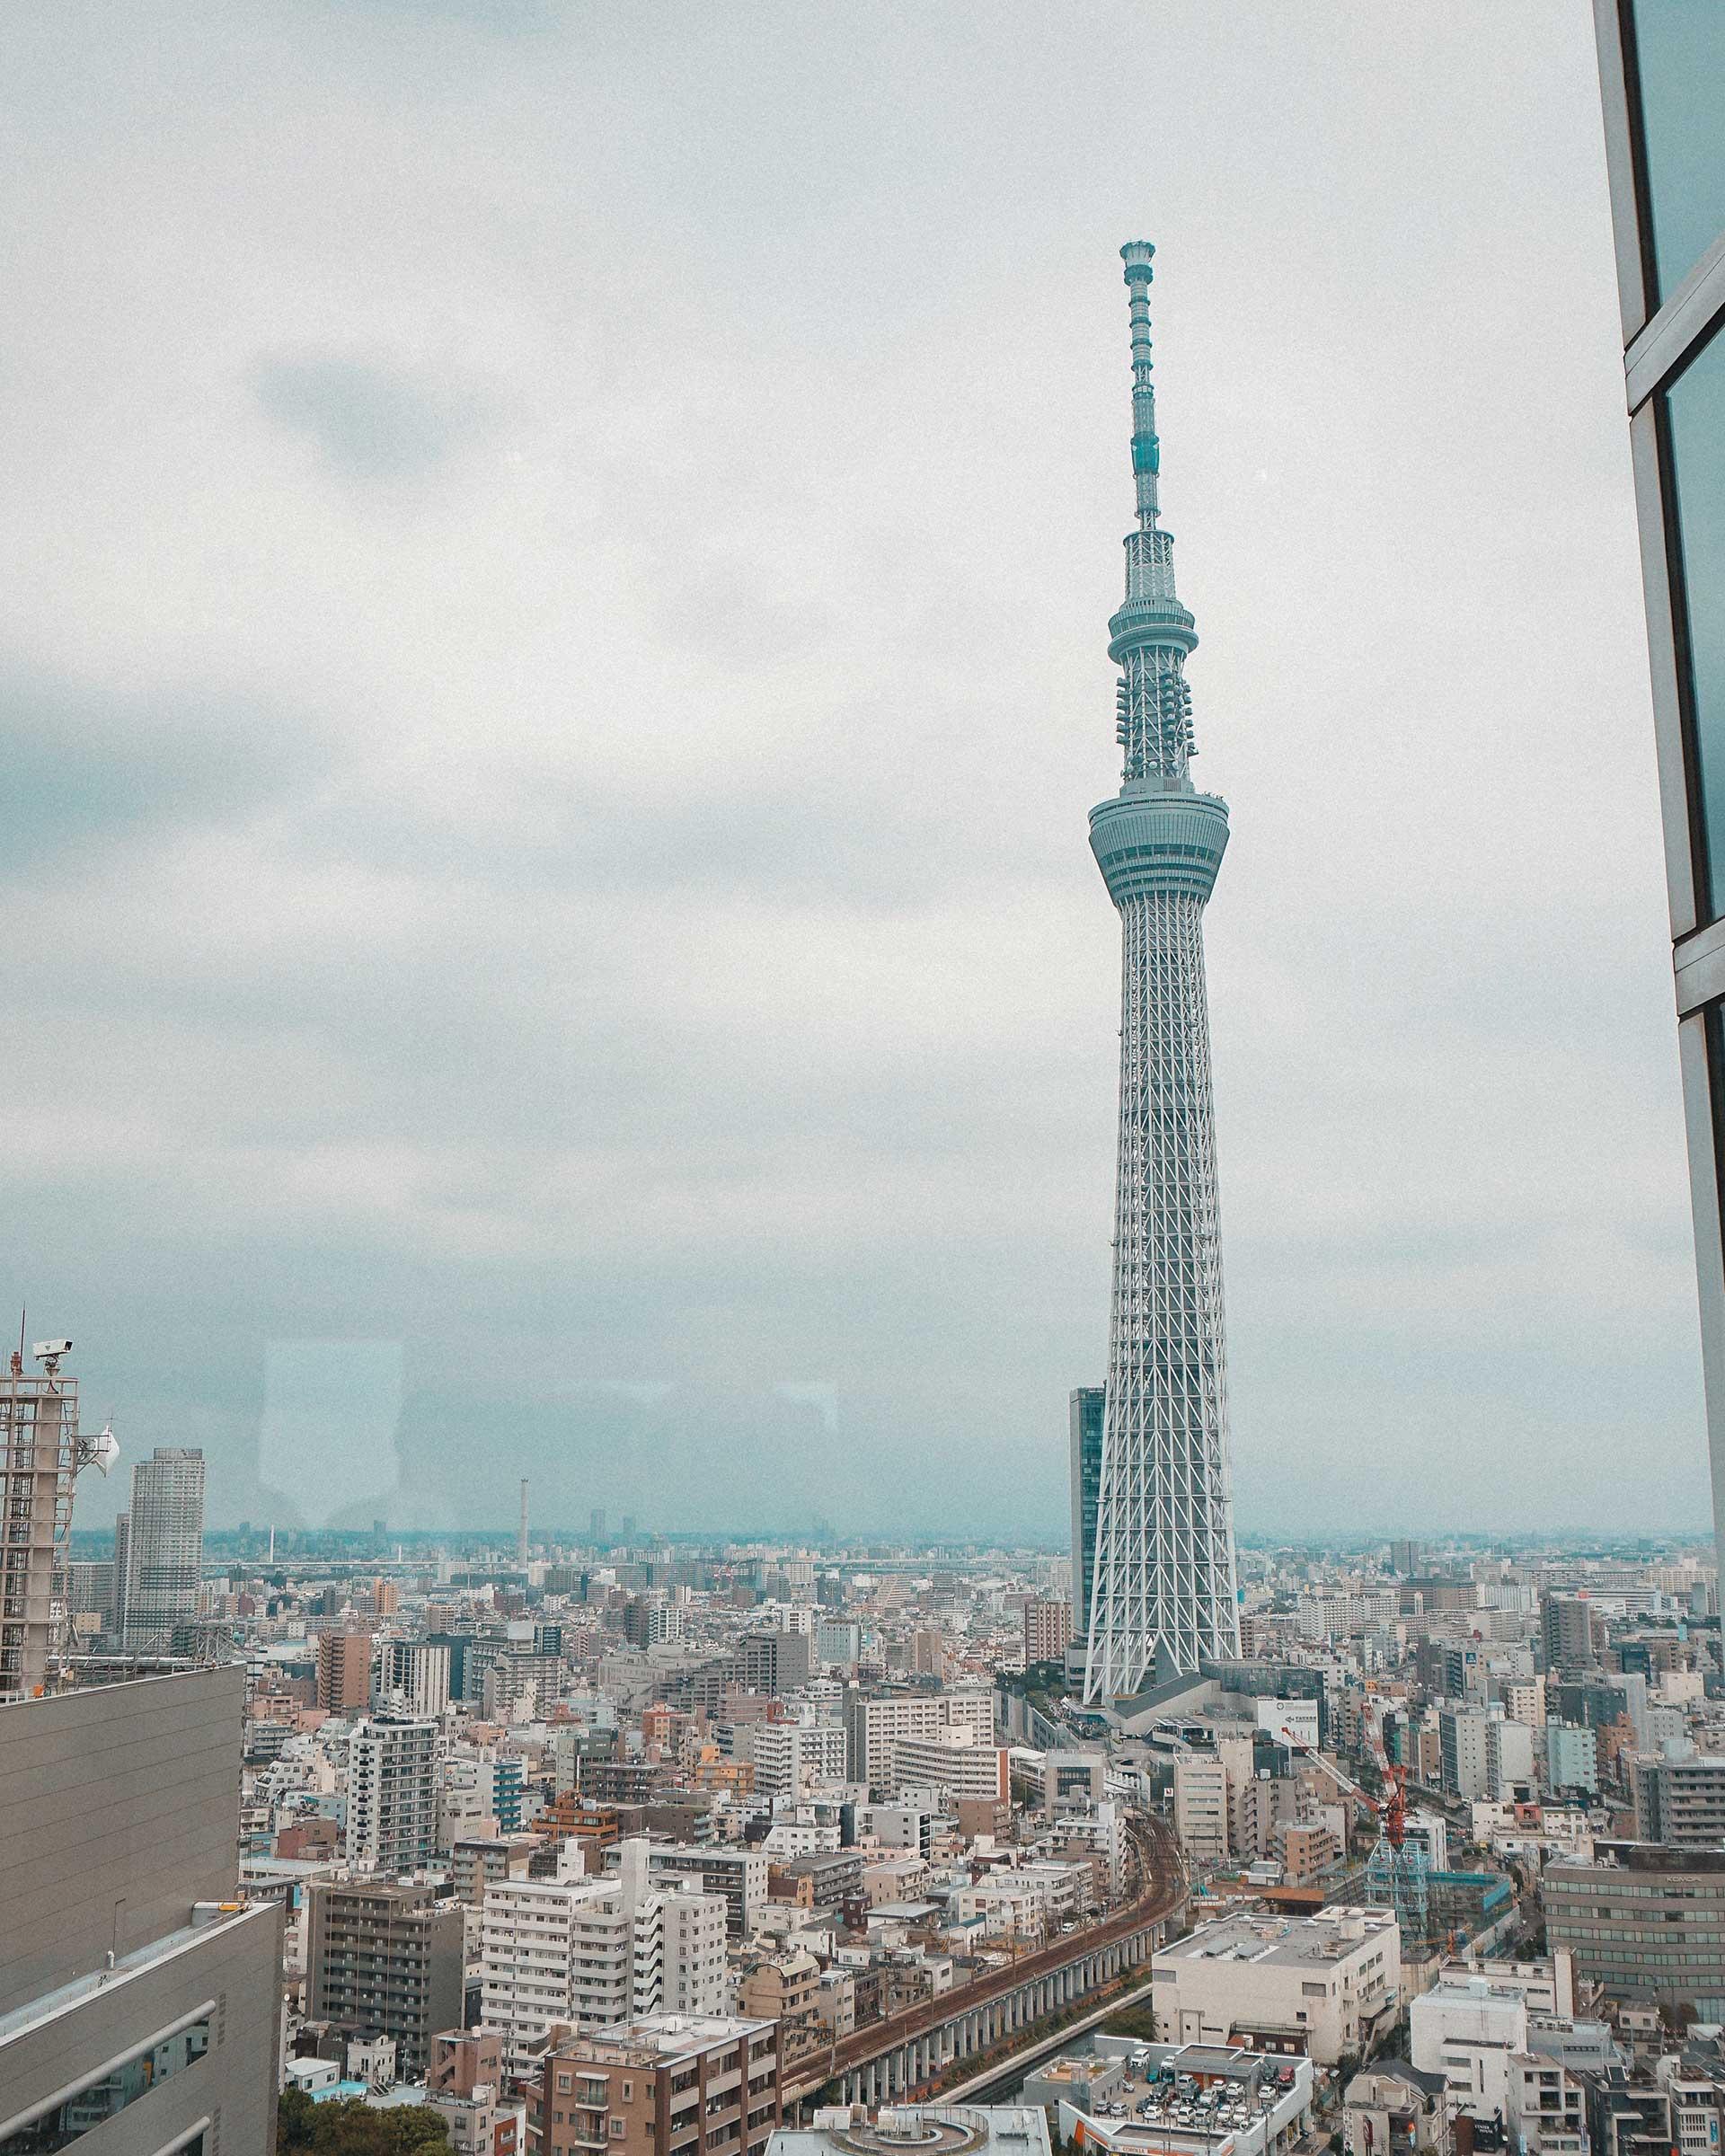 Tokyo Skytree (東京スカイツリー) view from Asahi Sky Room